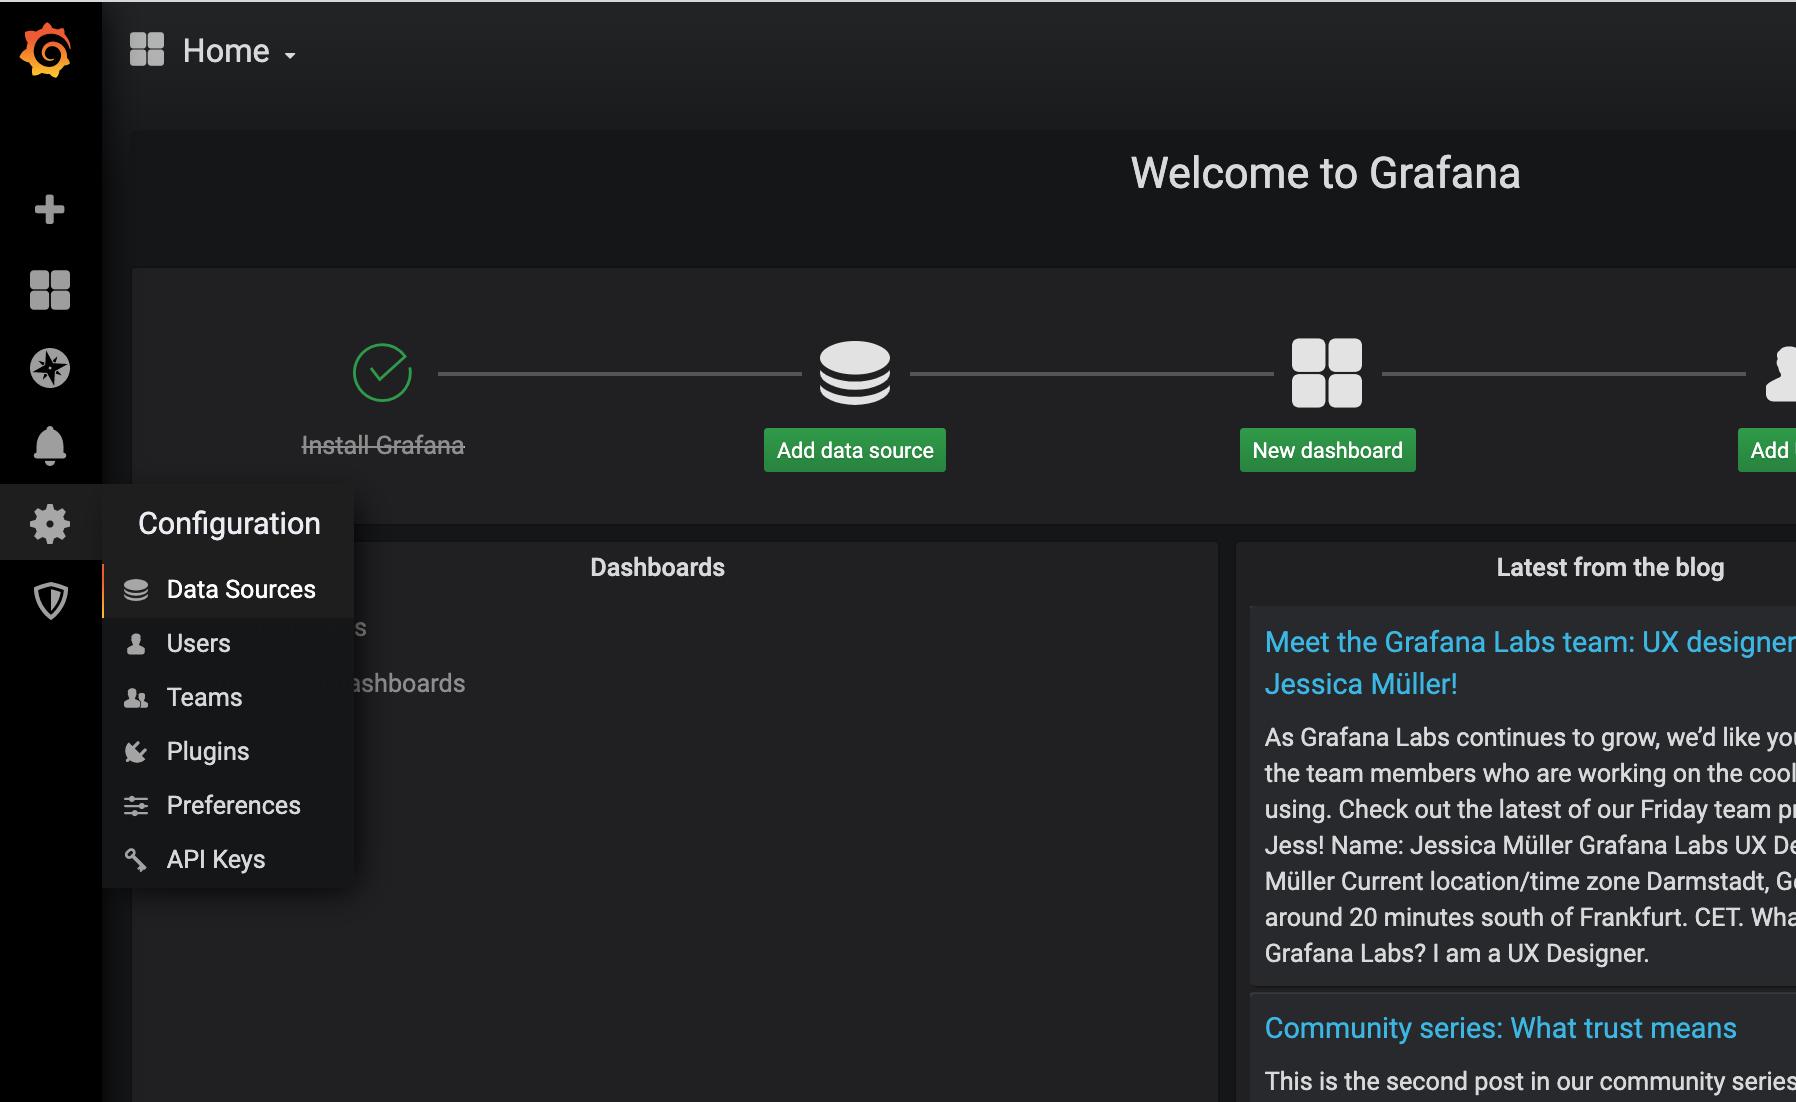 access-grafana-home-page